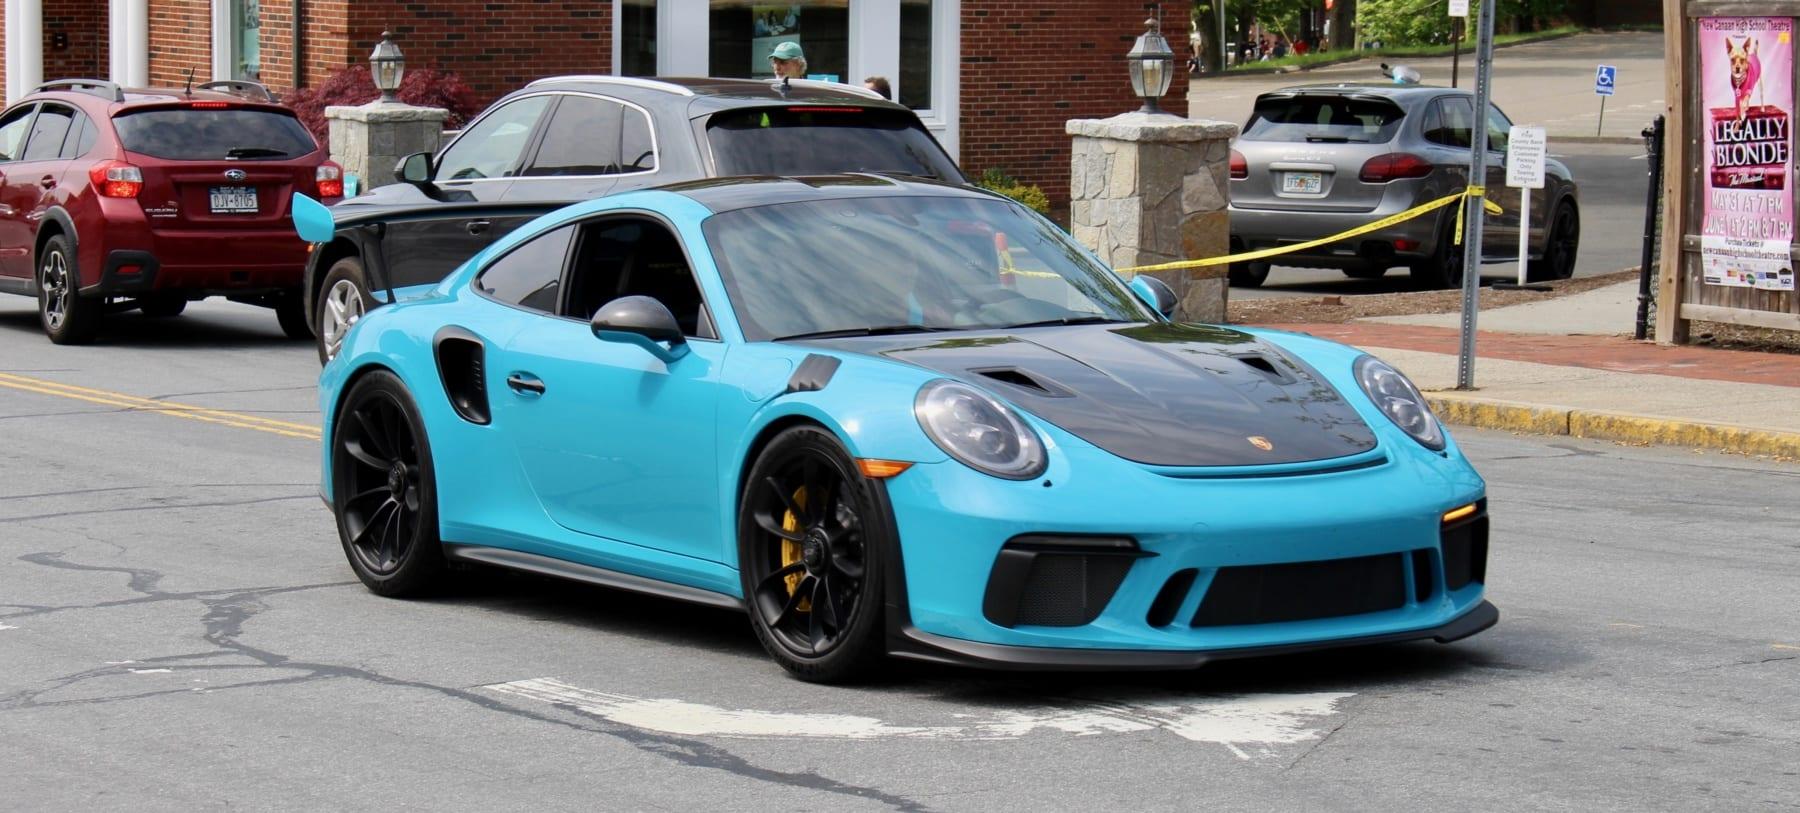 Miami Blue Porsche 911